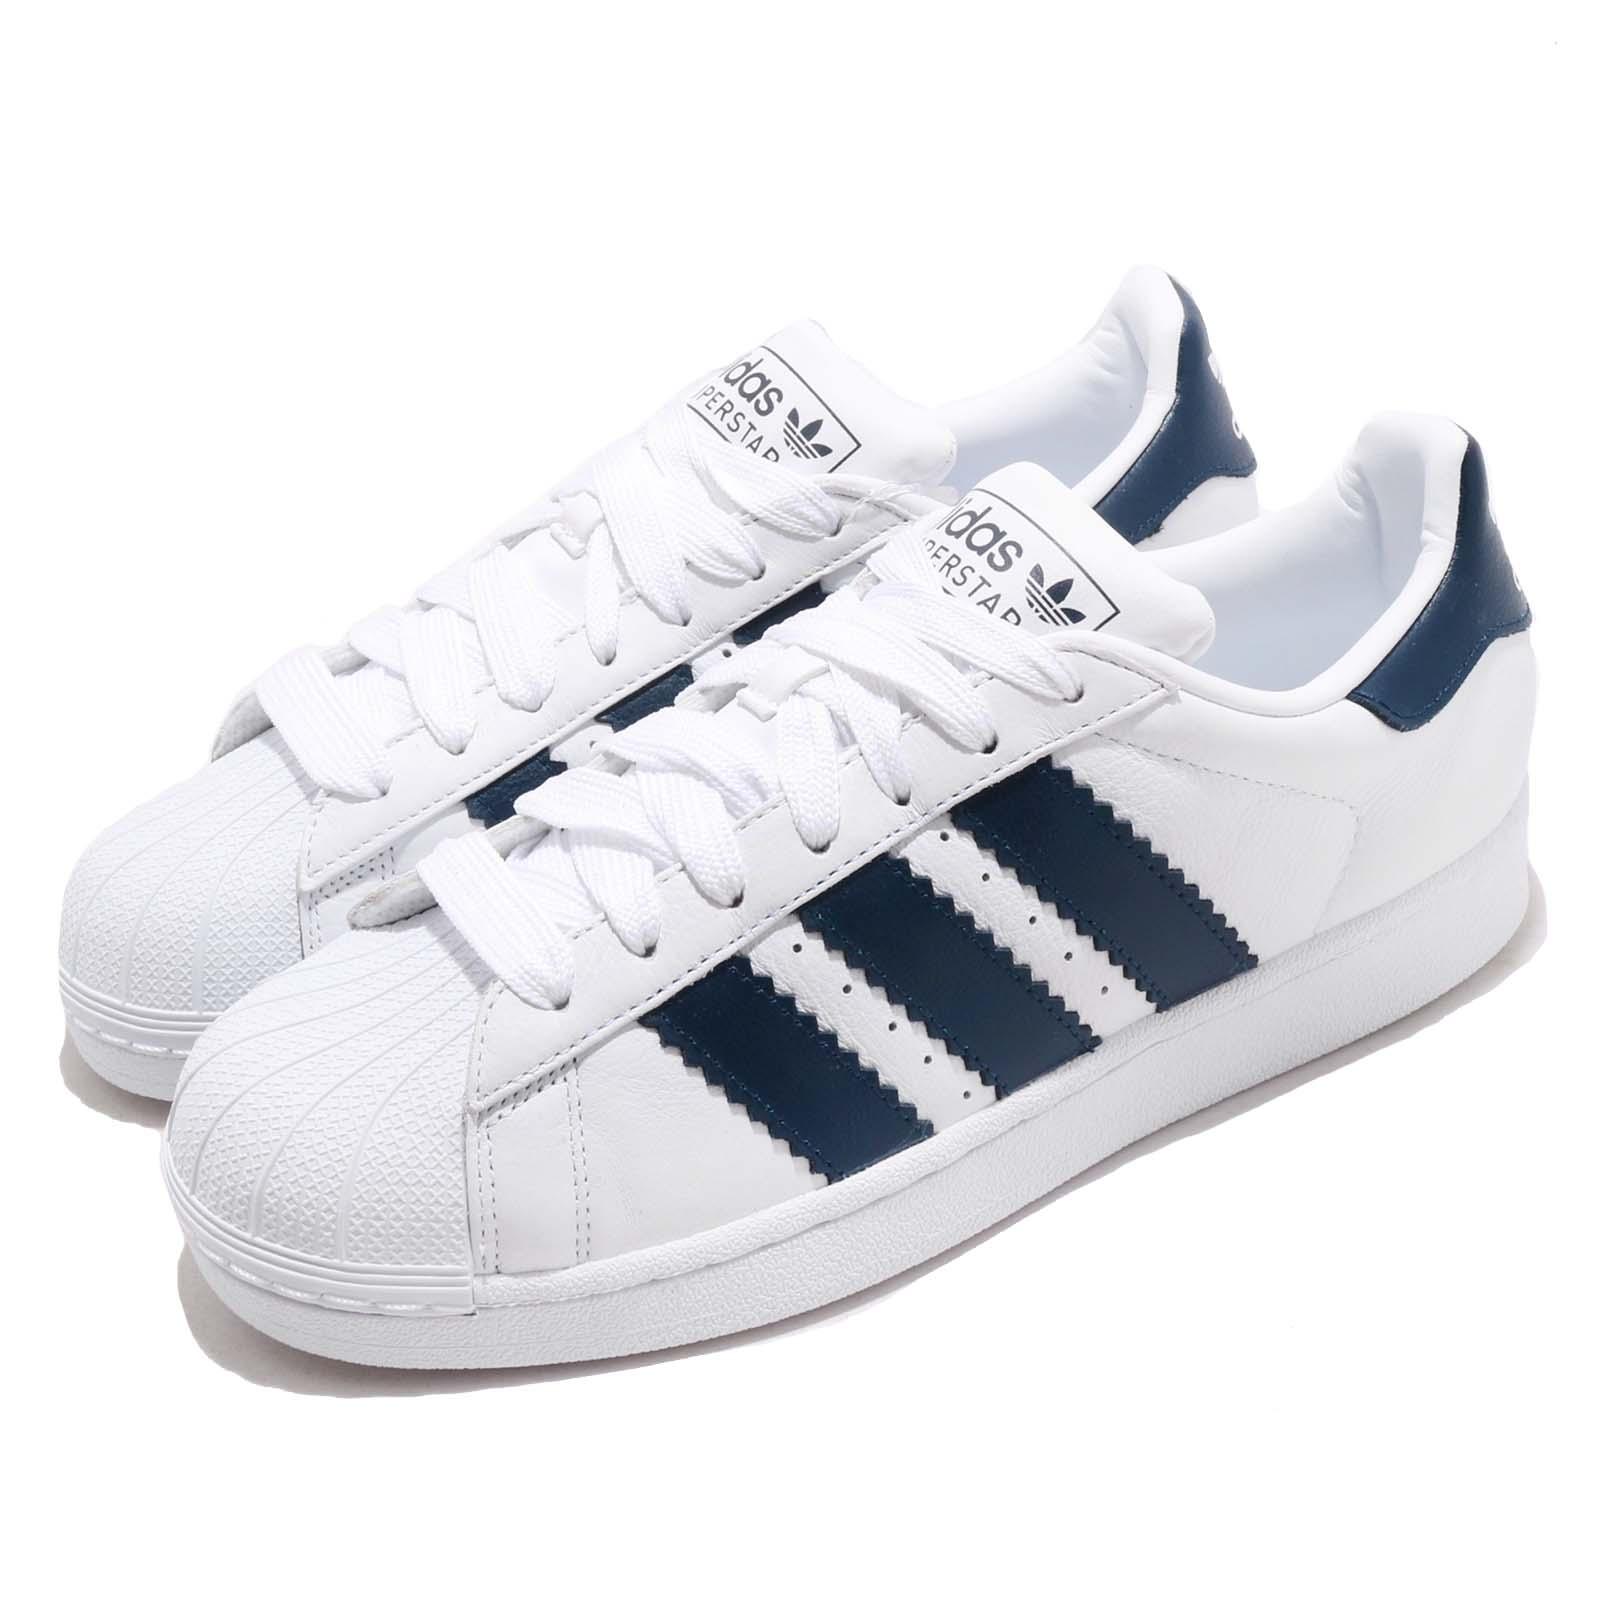 adidas 休閒鞋 Superstar 復古 男女鞋 BD8069